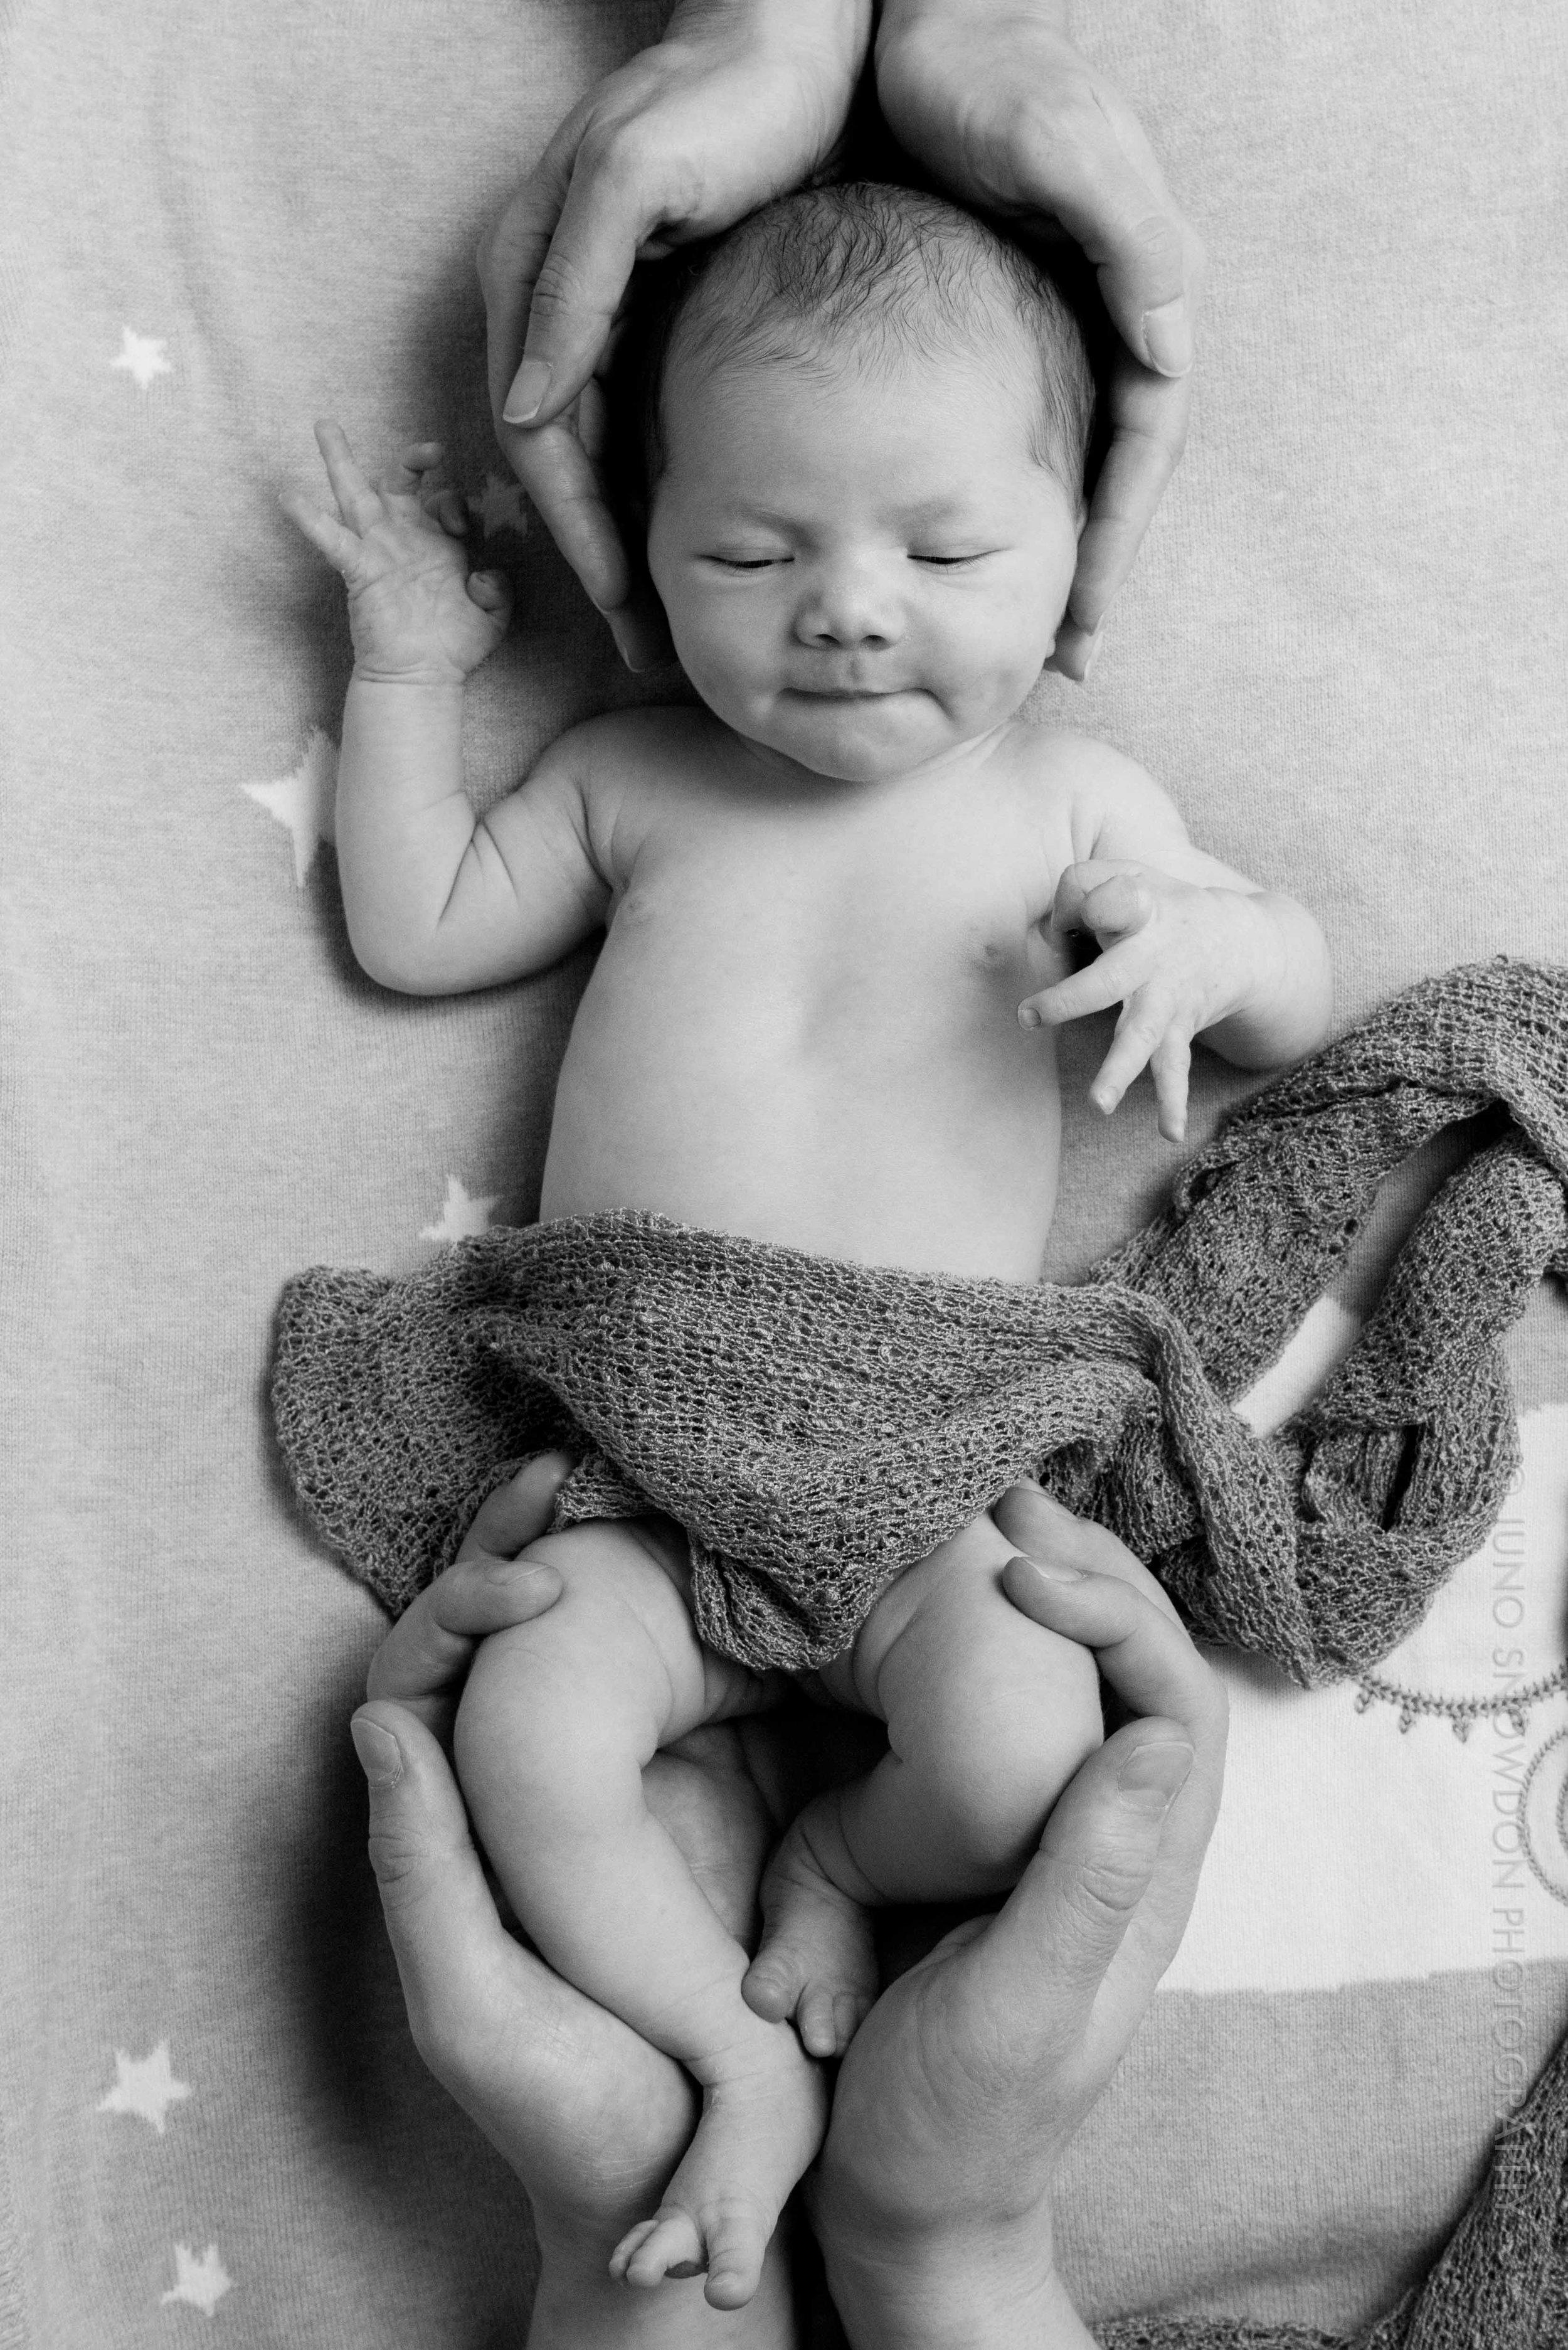 juno-snowdon-photography-newborn-portrait-7103.jpg